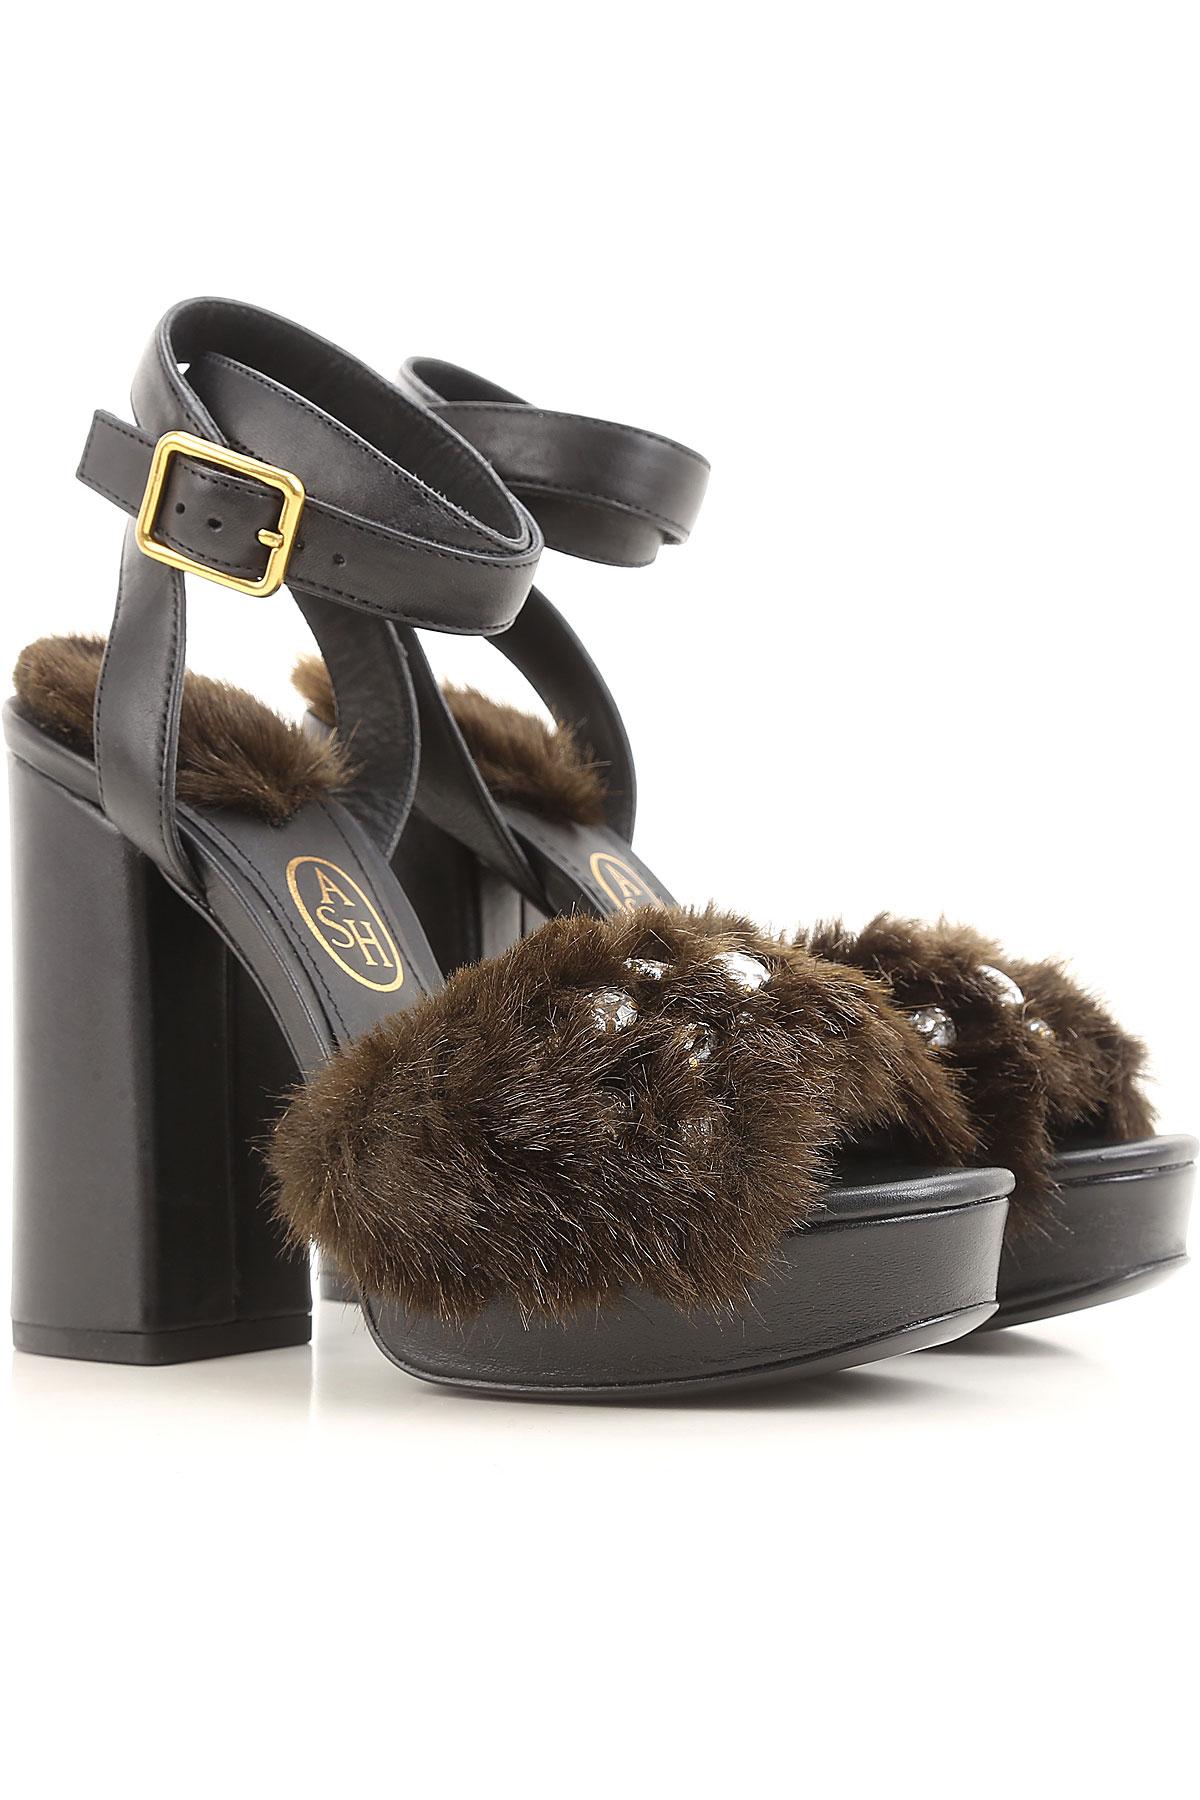 ProduitBeluga Chaussures AshCode Chaussures Femme ProduitBeluga Castagnanero AshCode Castagnanero Femme yvm08nwON